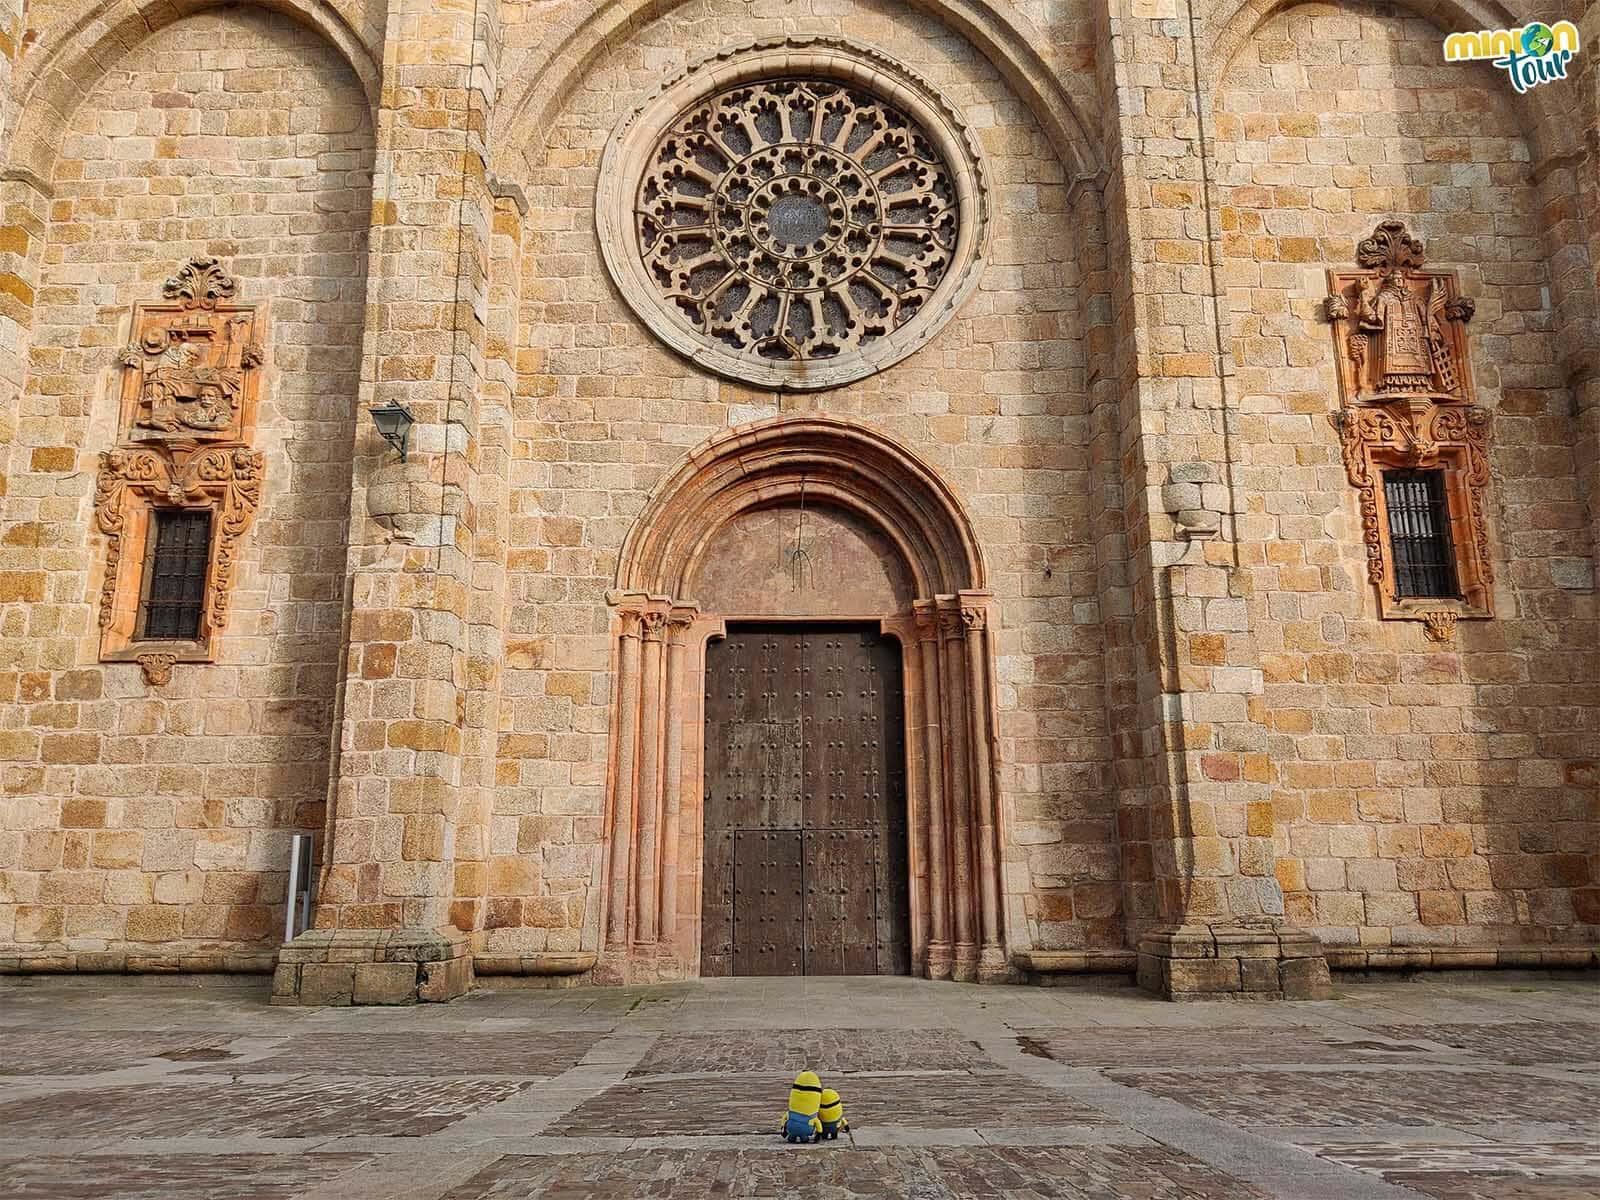 Mirando la fachada de la Catedral de Mondoñedo